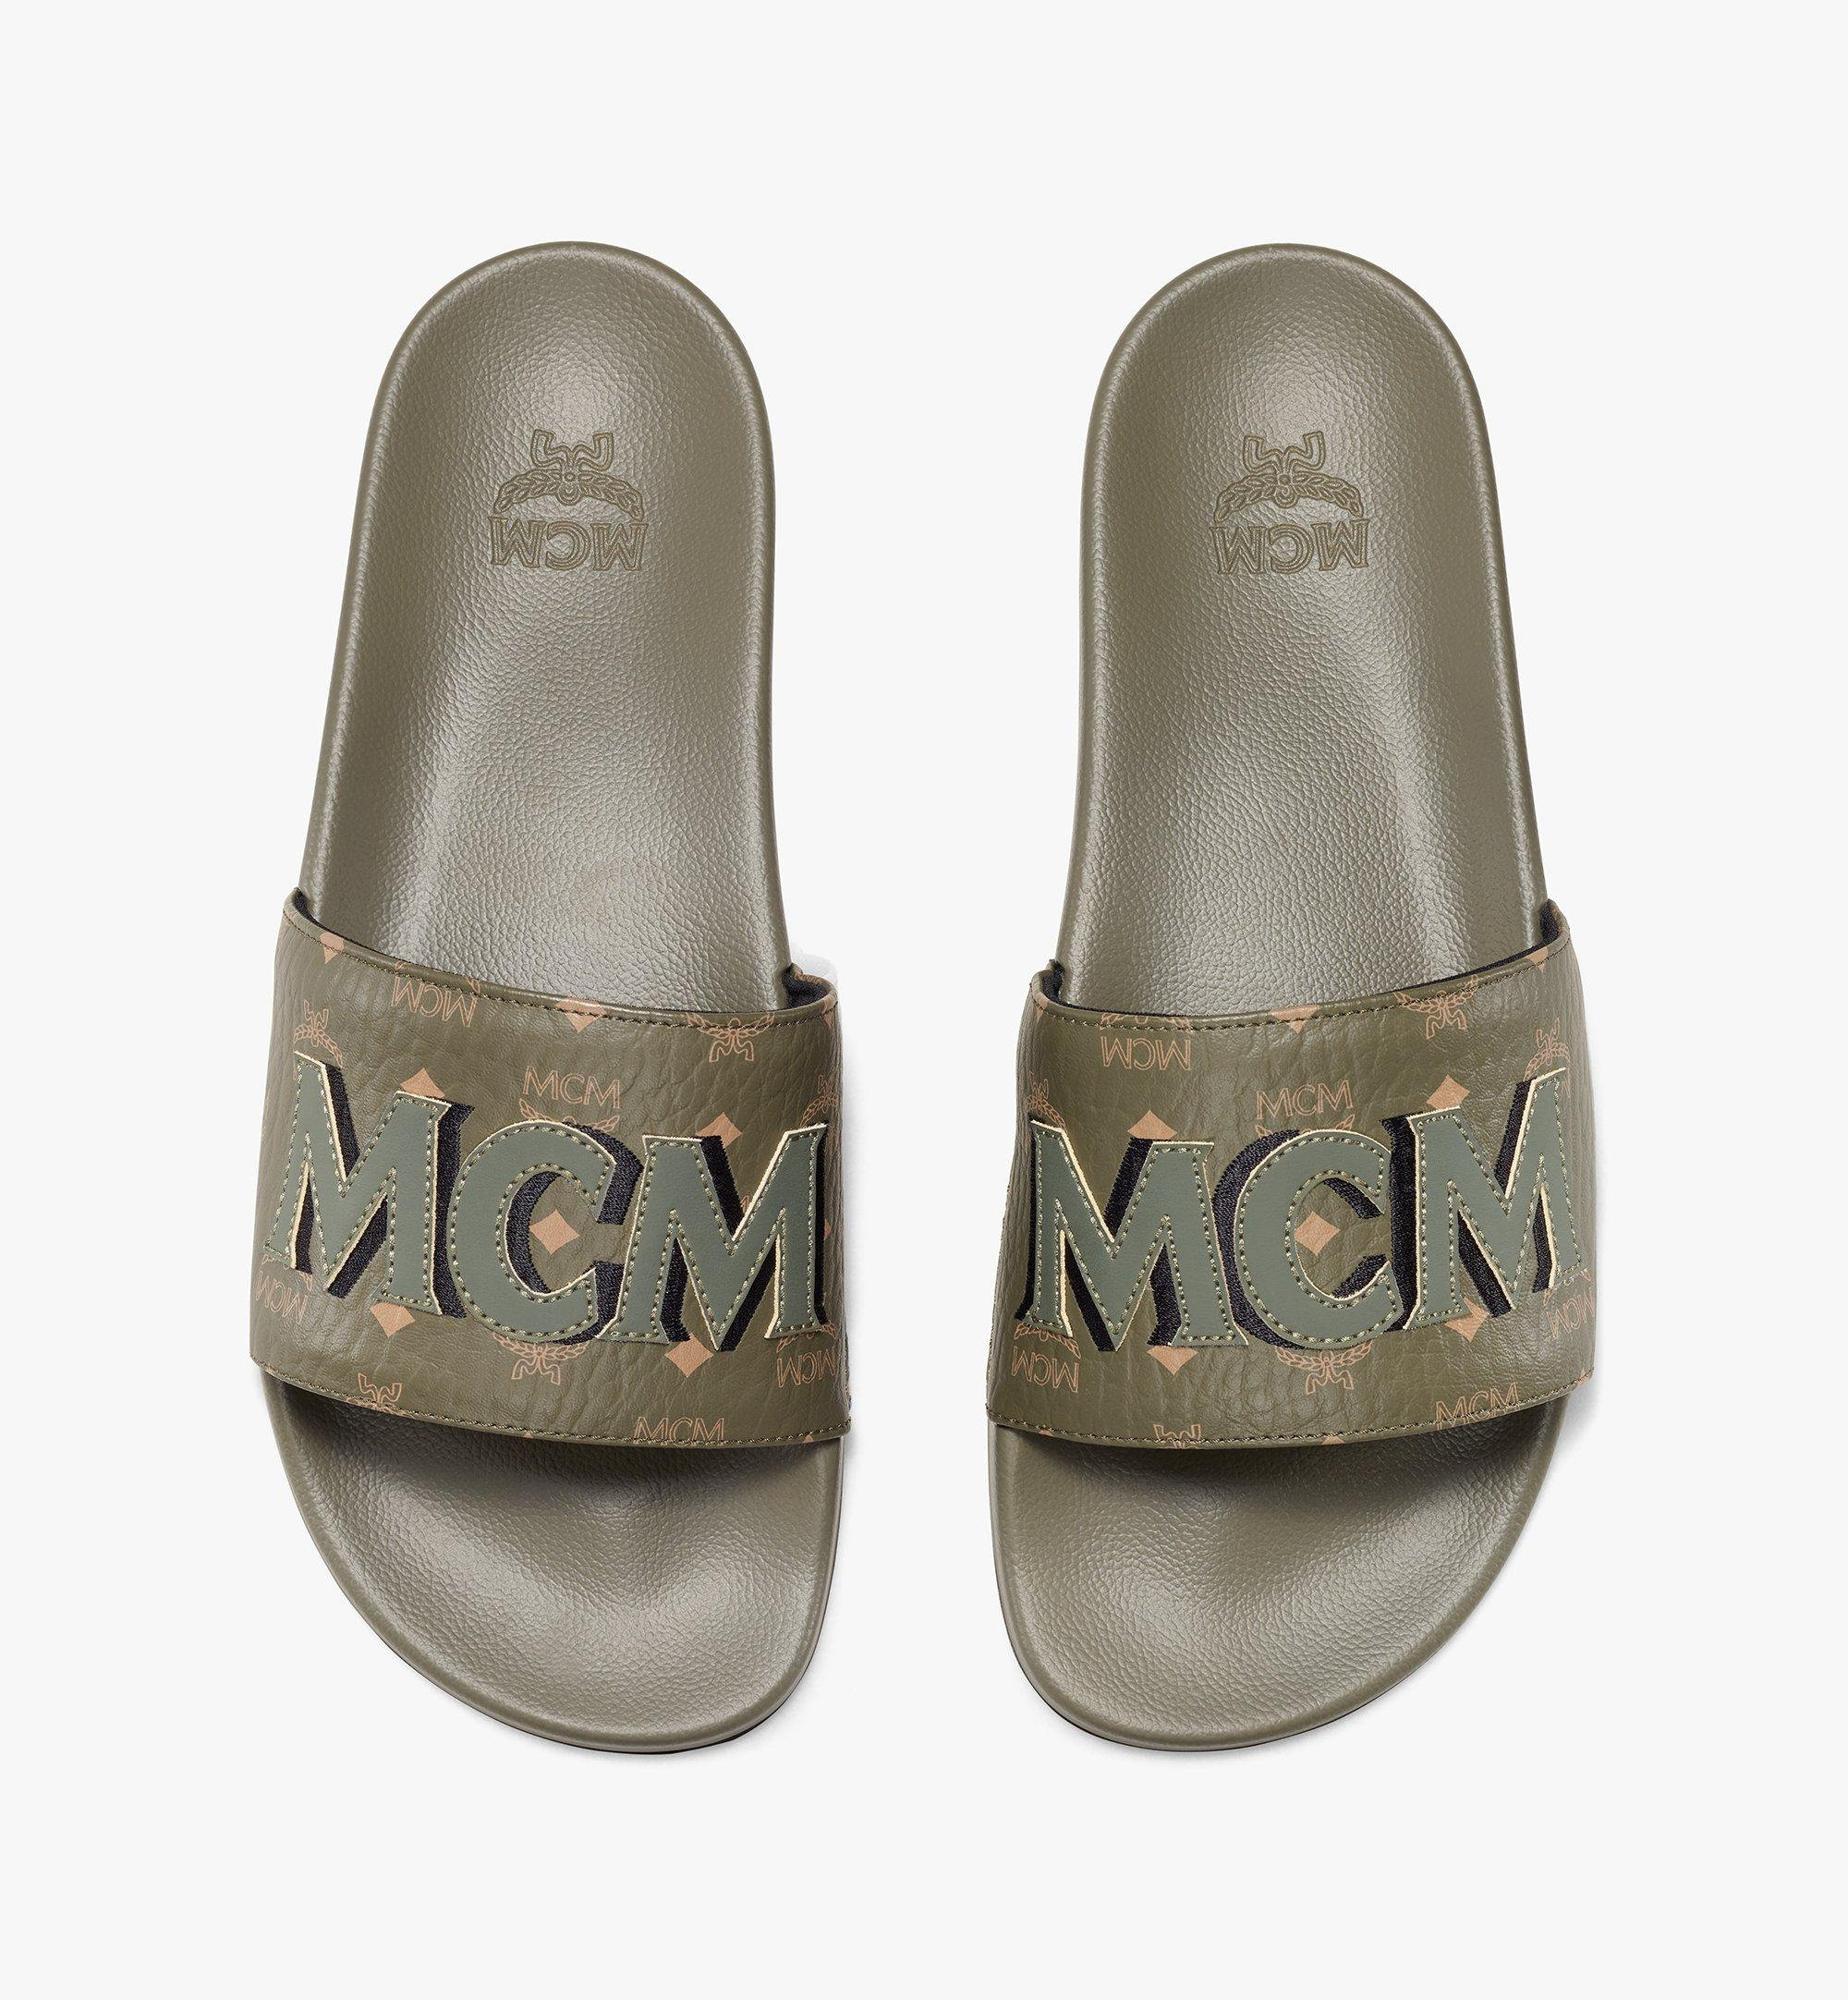 MCM รองเท้าแตะ MCM โมโนแกรมสำหรับผู้ชาย Green MEXAAMM16JH043 มุมมองอื่น 4